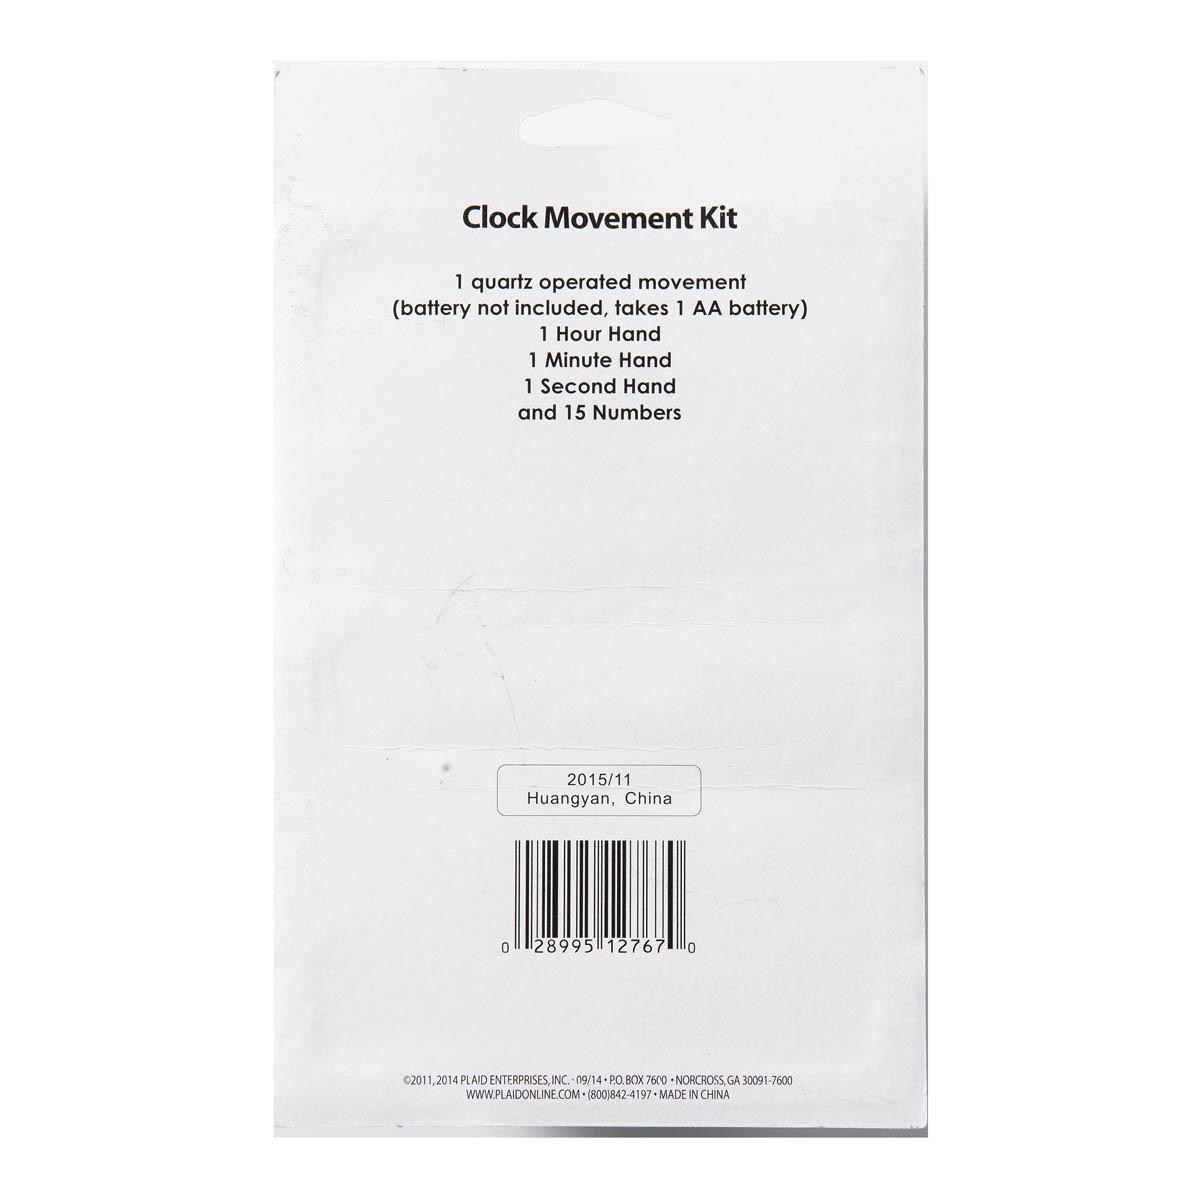 Plaid ® Wood Surfaces - Accessories - Clock Movement Kit, 19 pieces